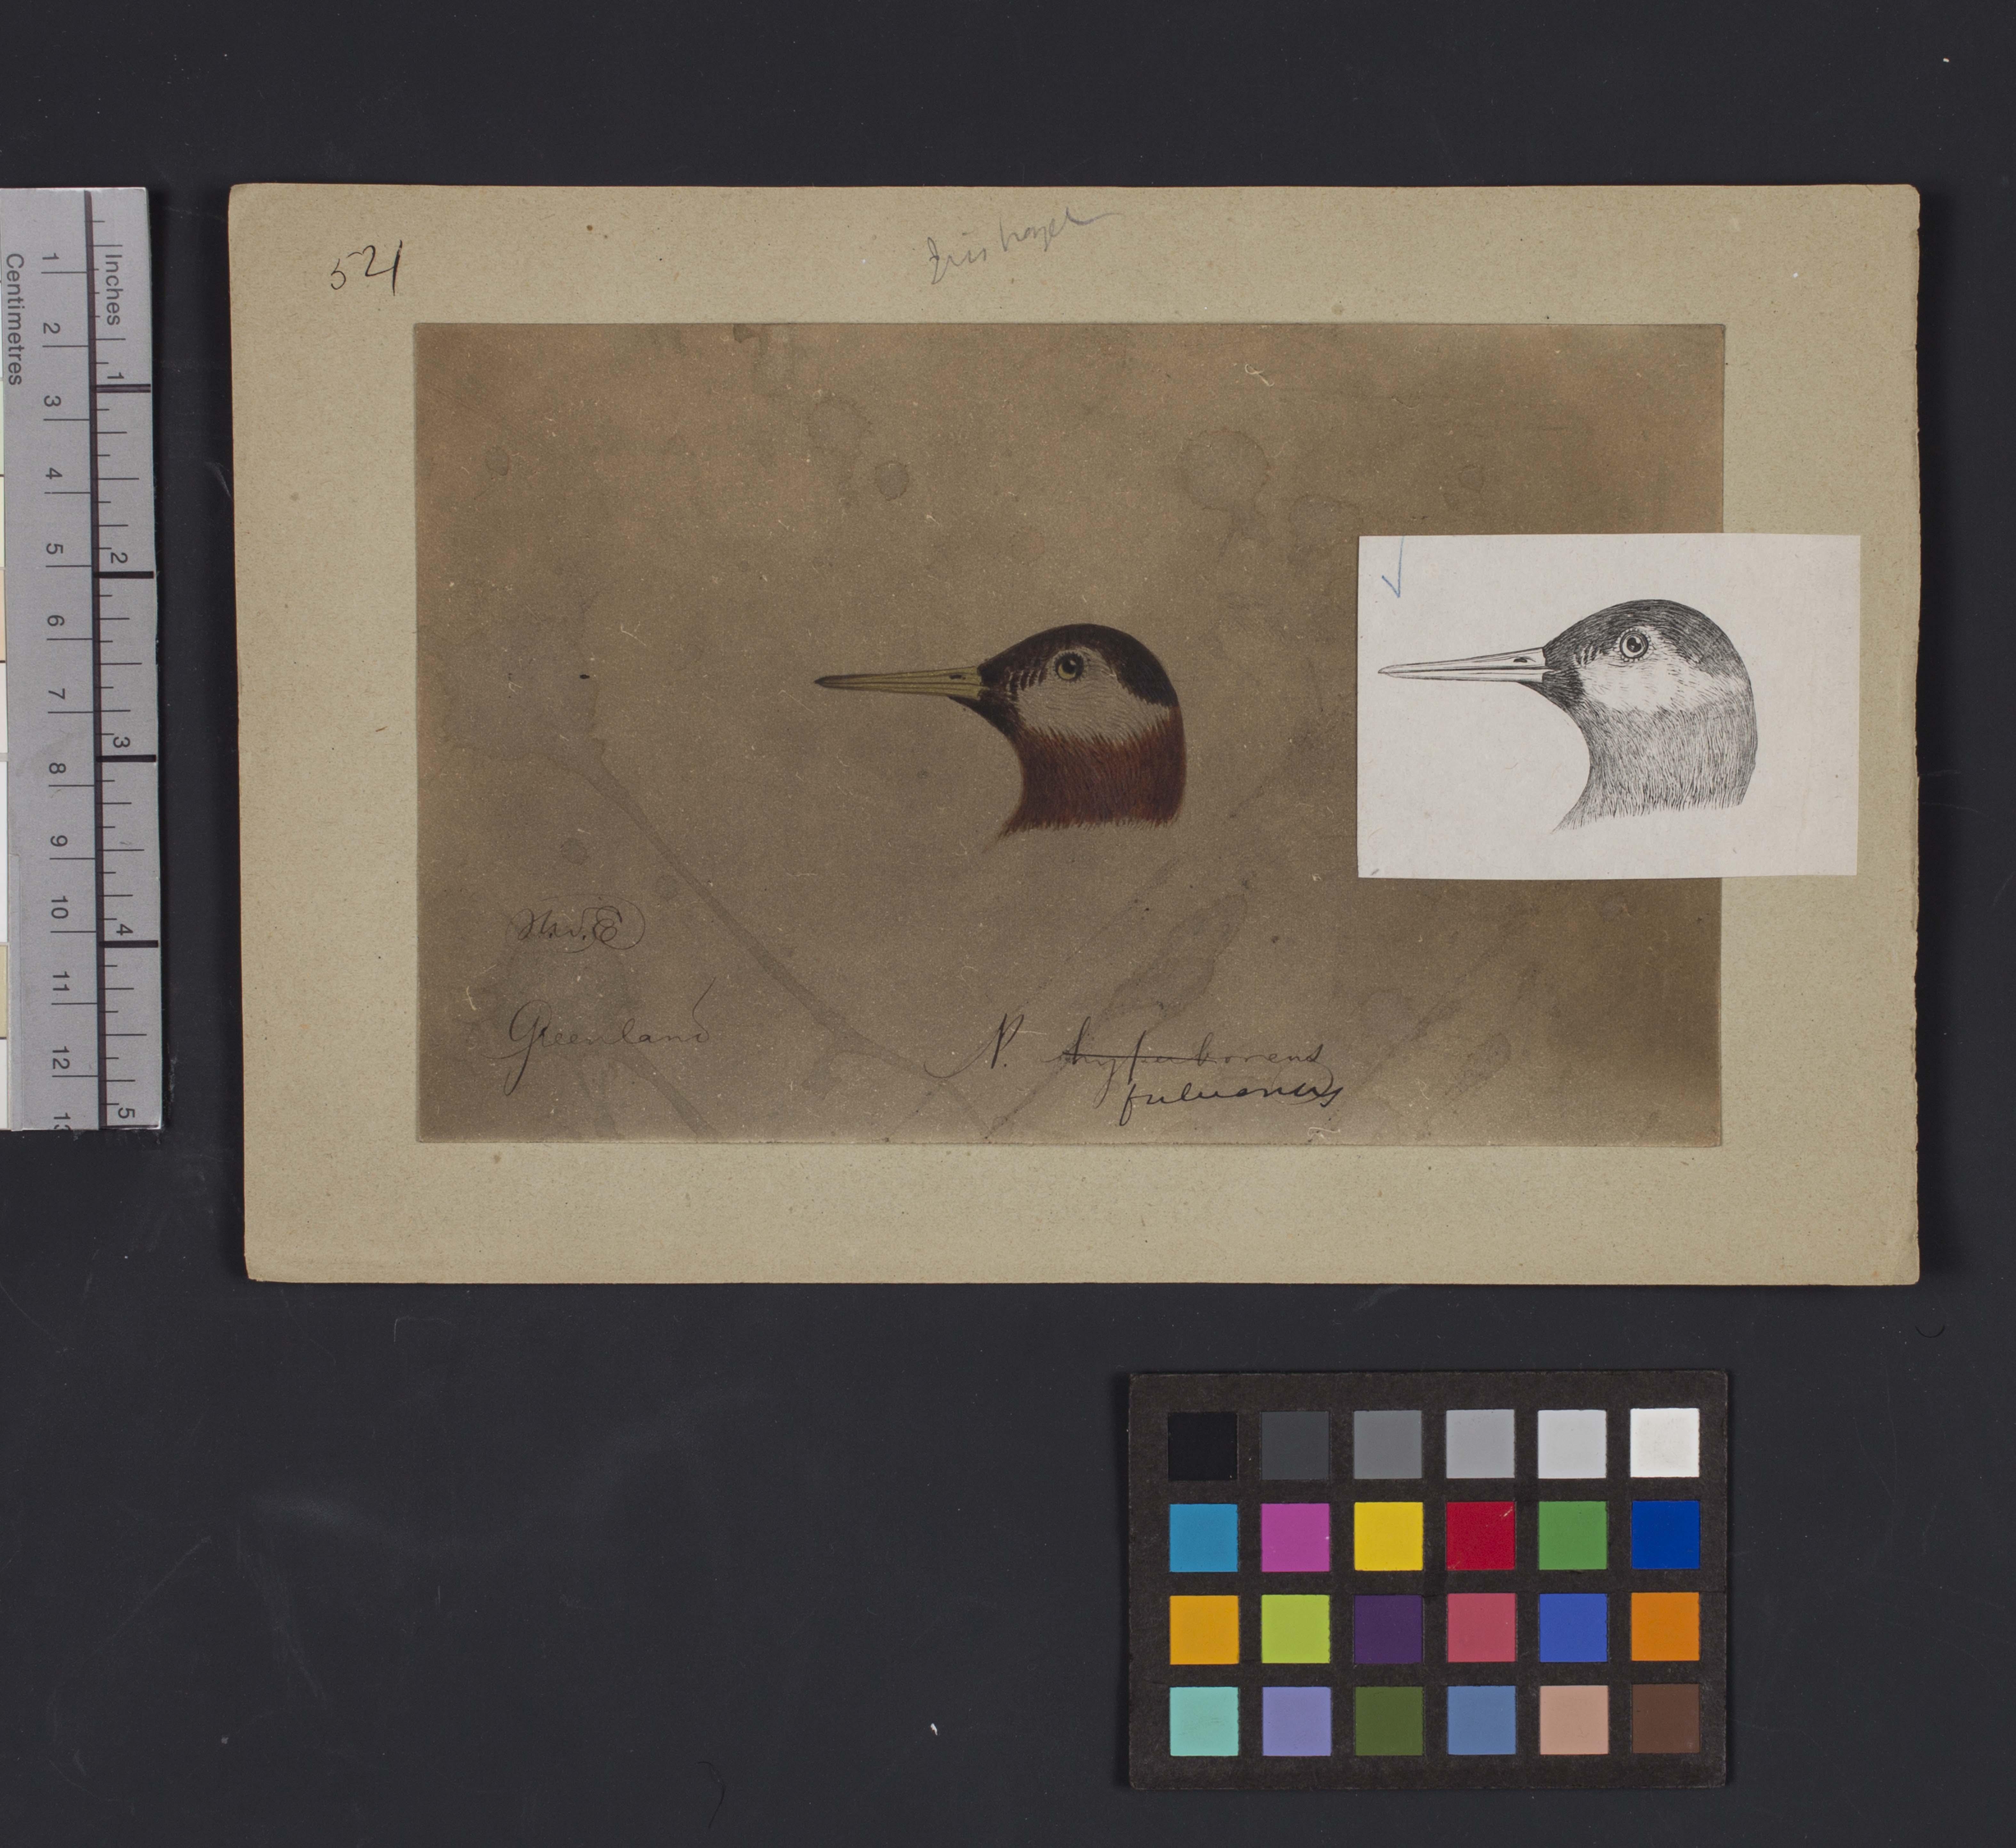 Bird head drawing by Robert Ridgway, Record Unit 7167 - Robert Ridgway Papers, circa 1850s-1919, Smi